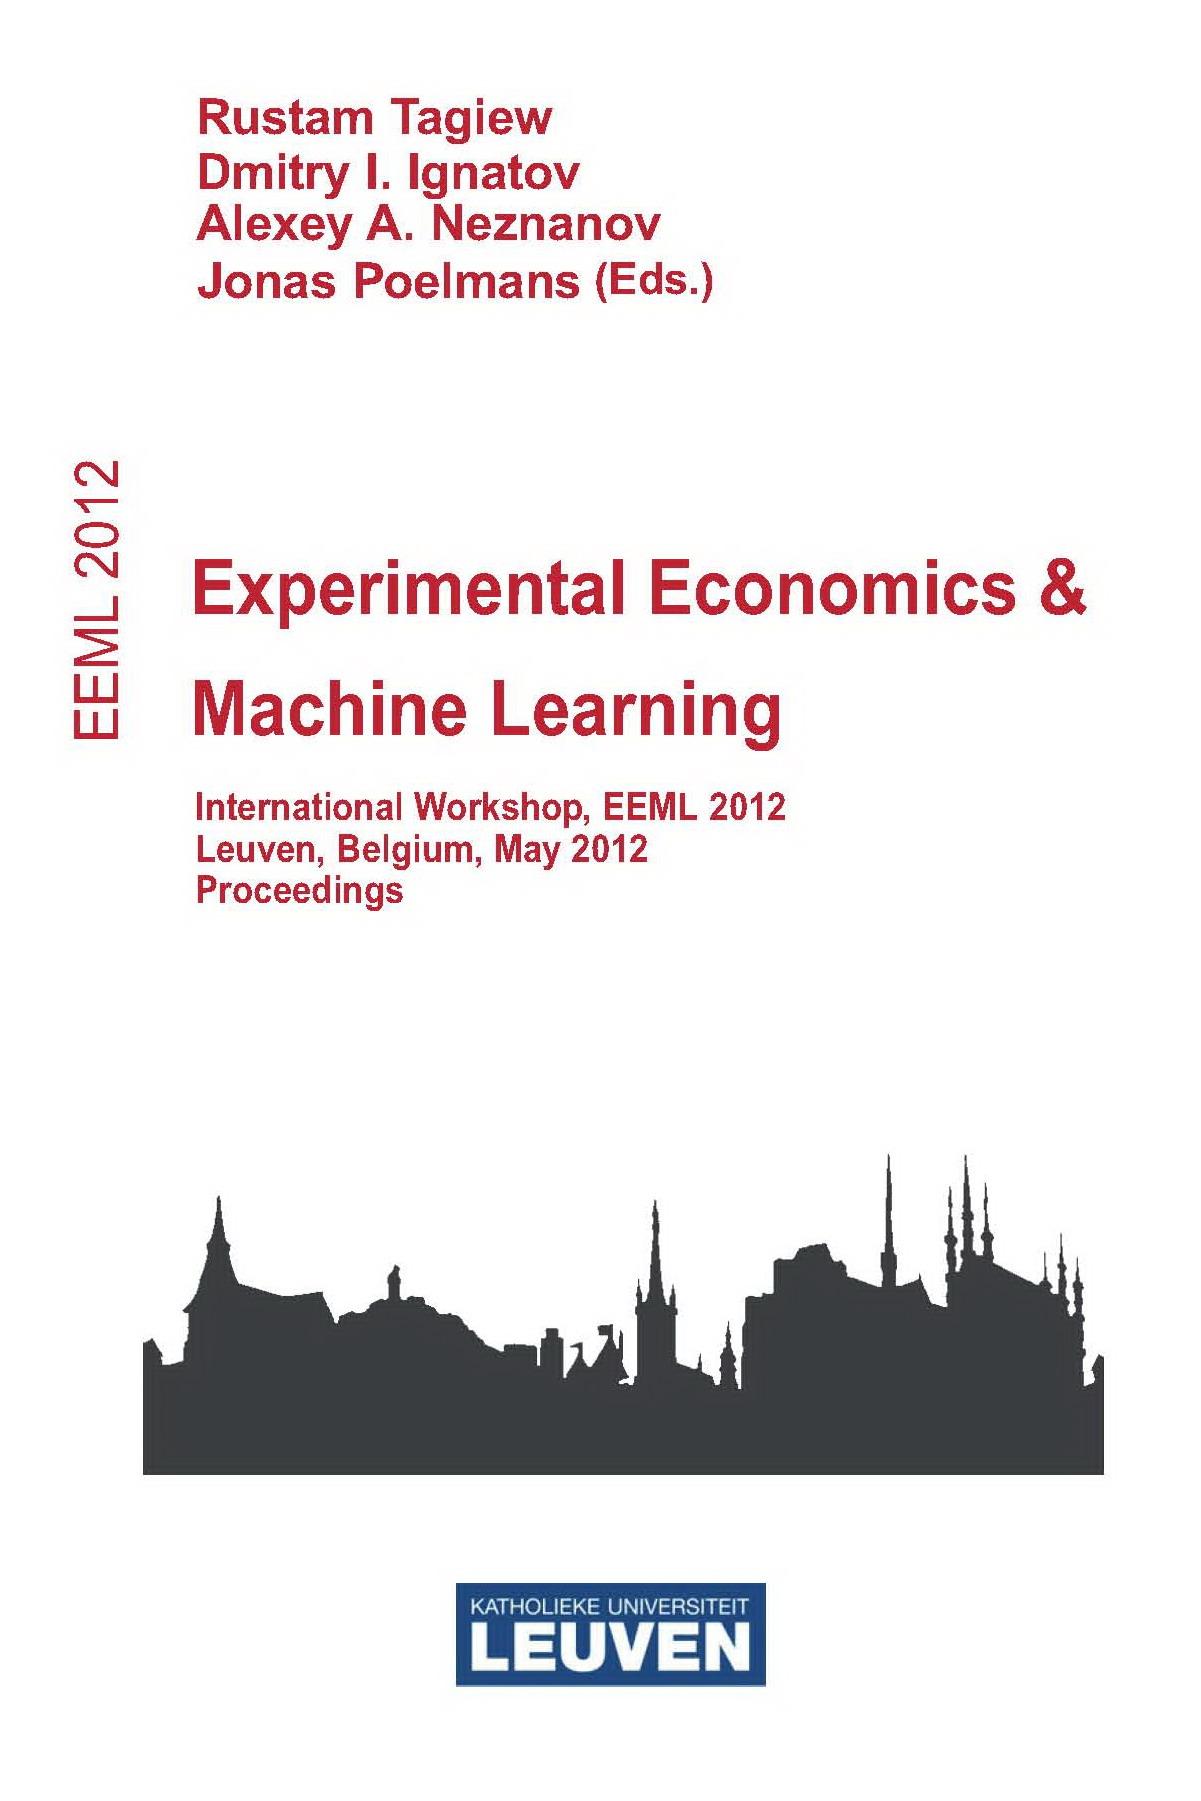 EEML 2012 – Experimental Economics in Machine Learning